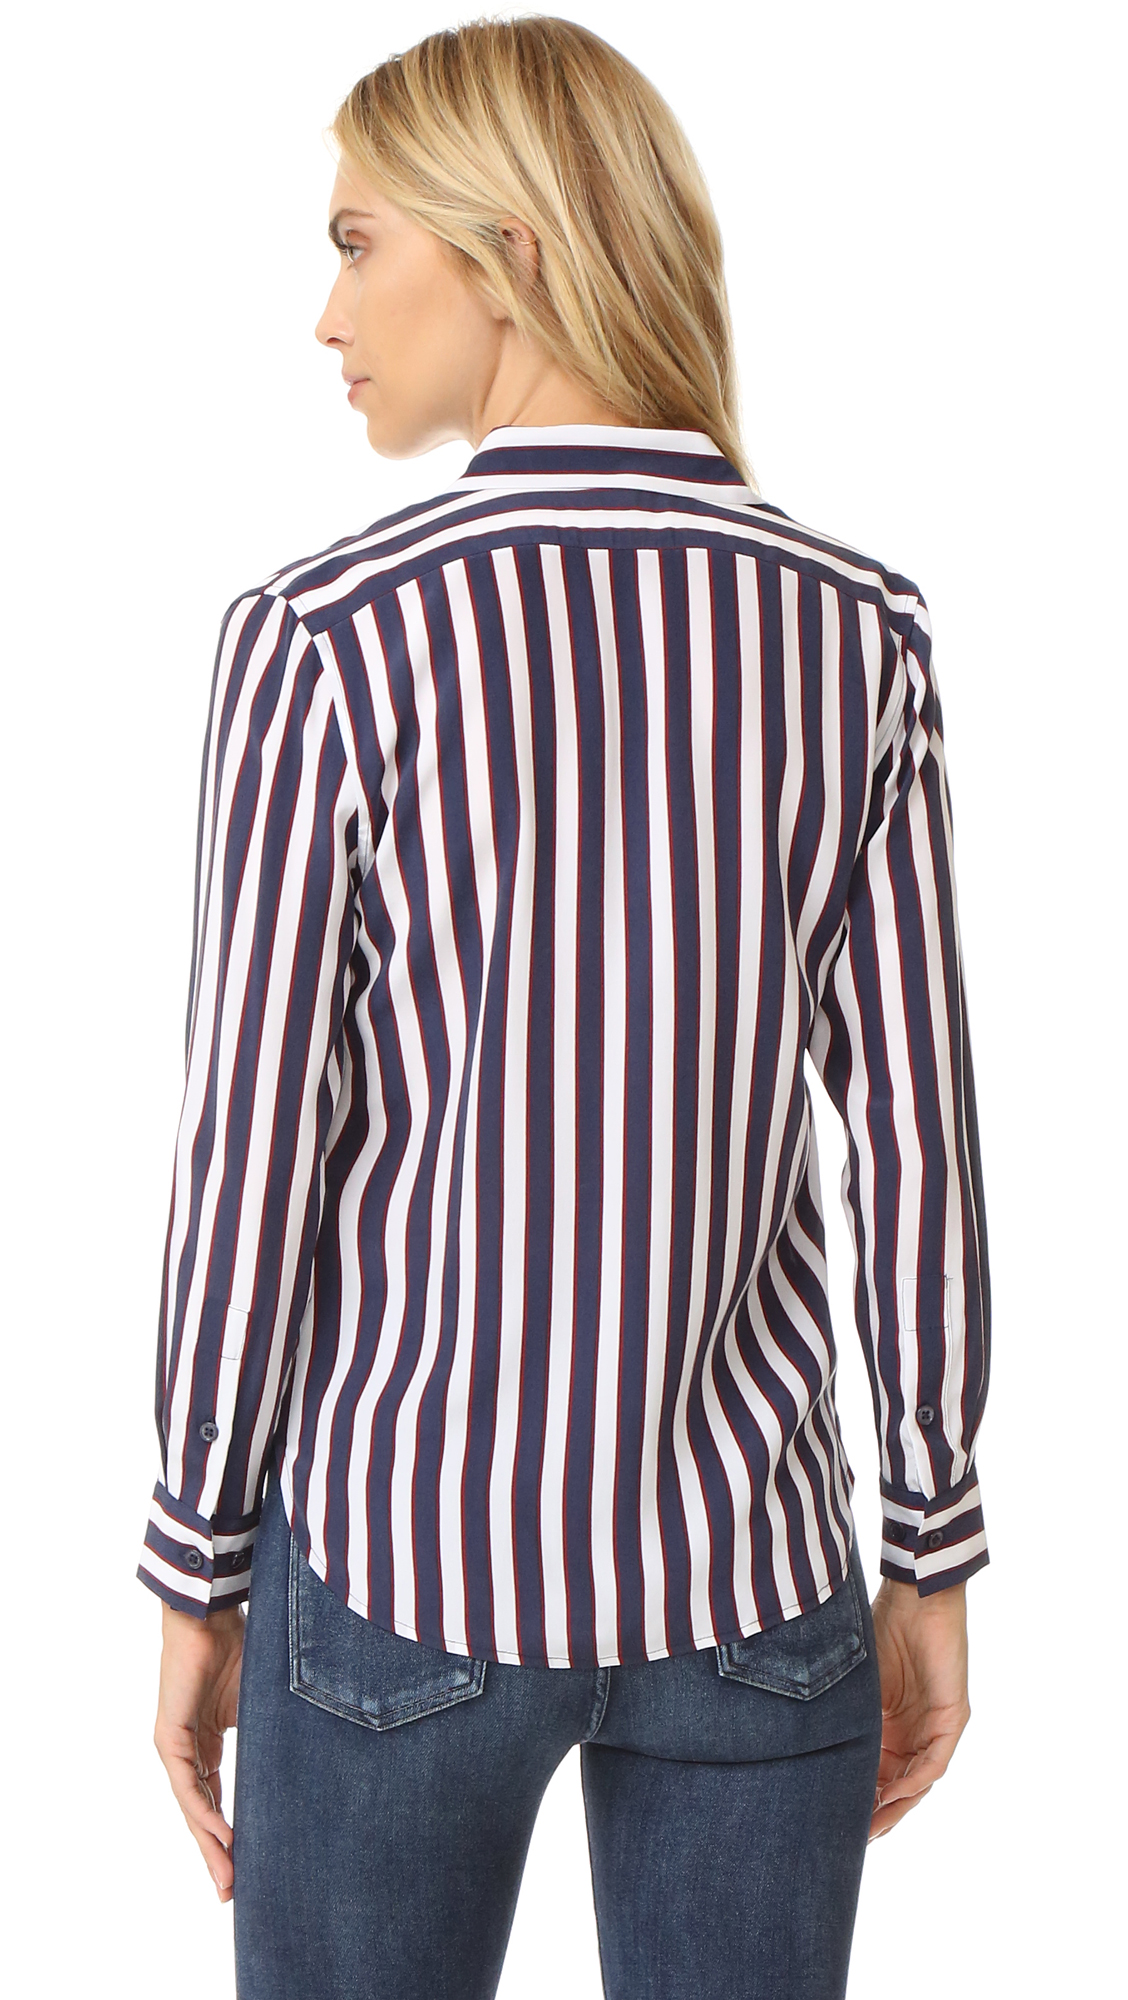 6a925064ef Purple Rain T Shirts Urban Outfitters | Top Mode Depot